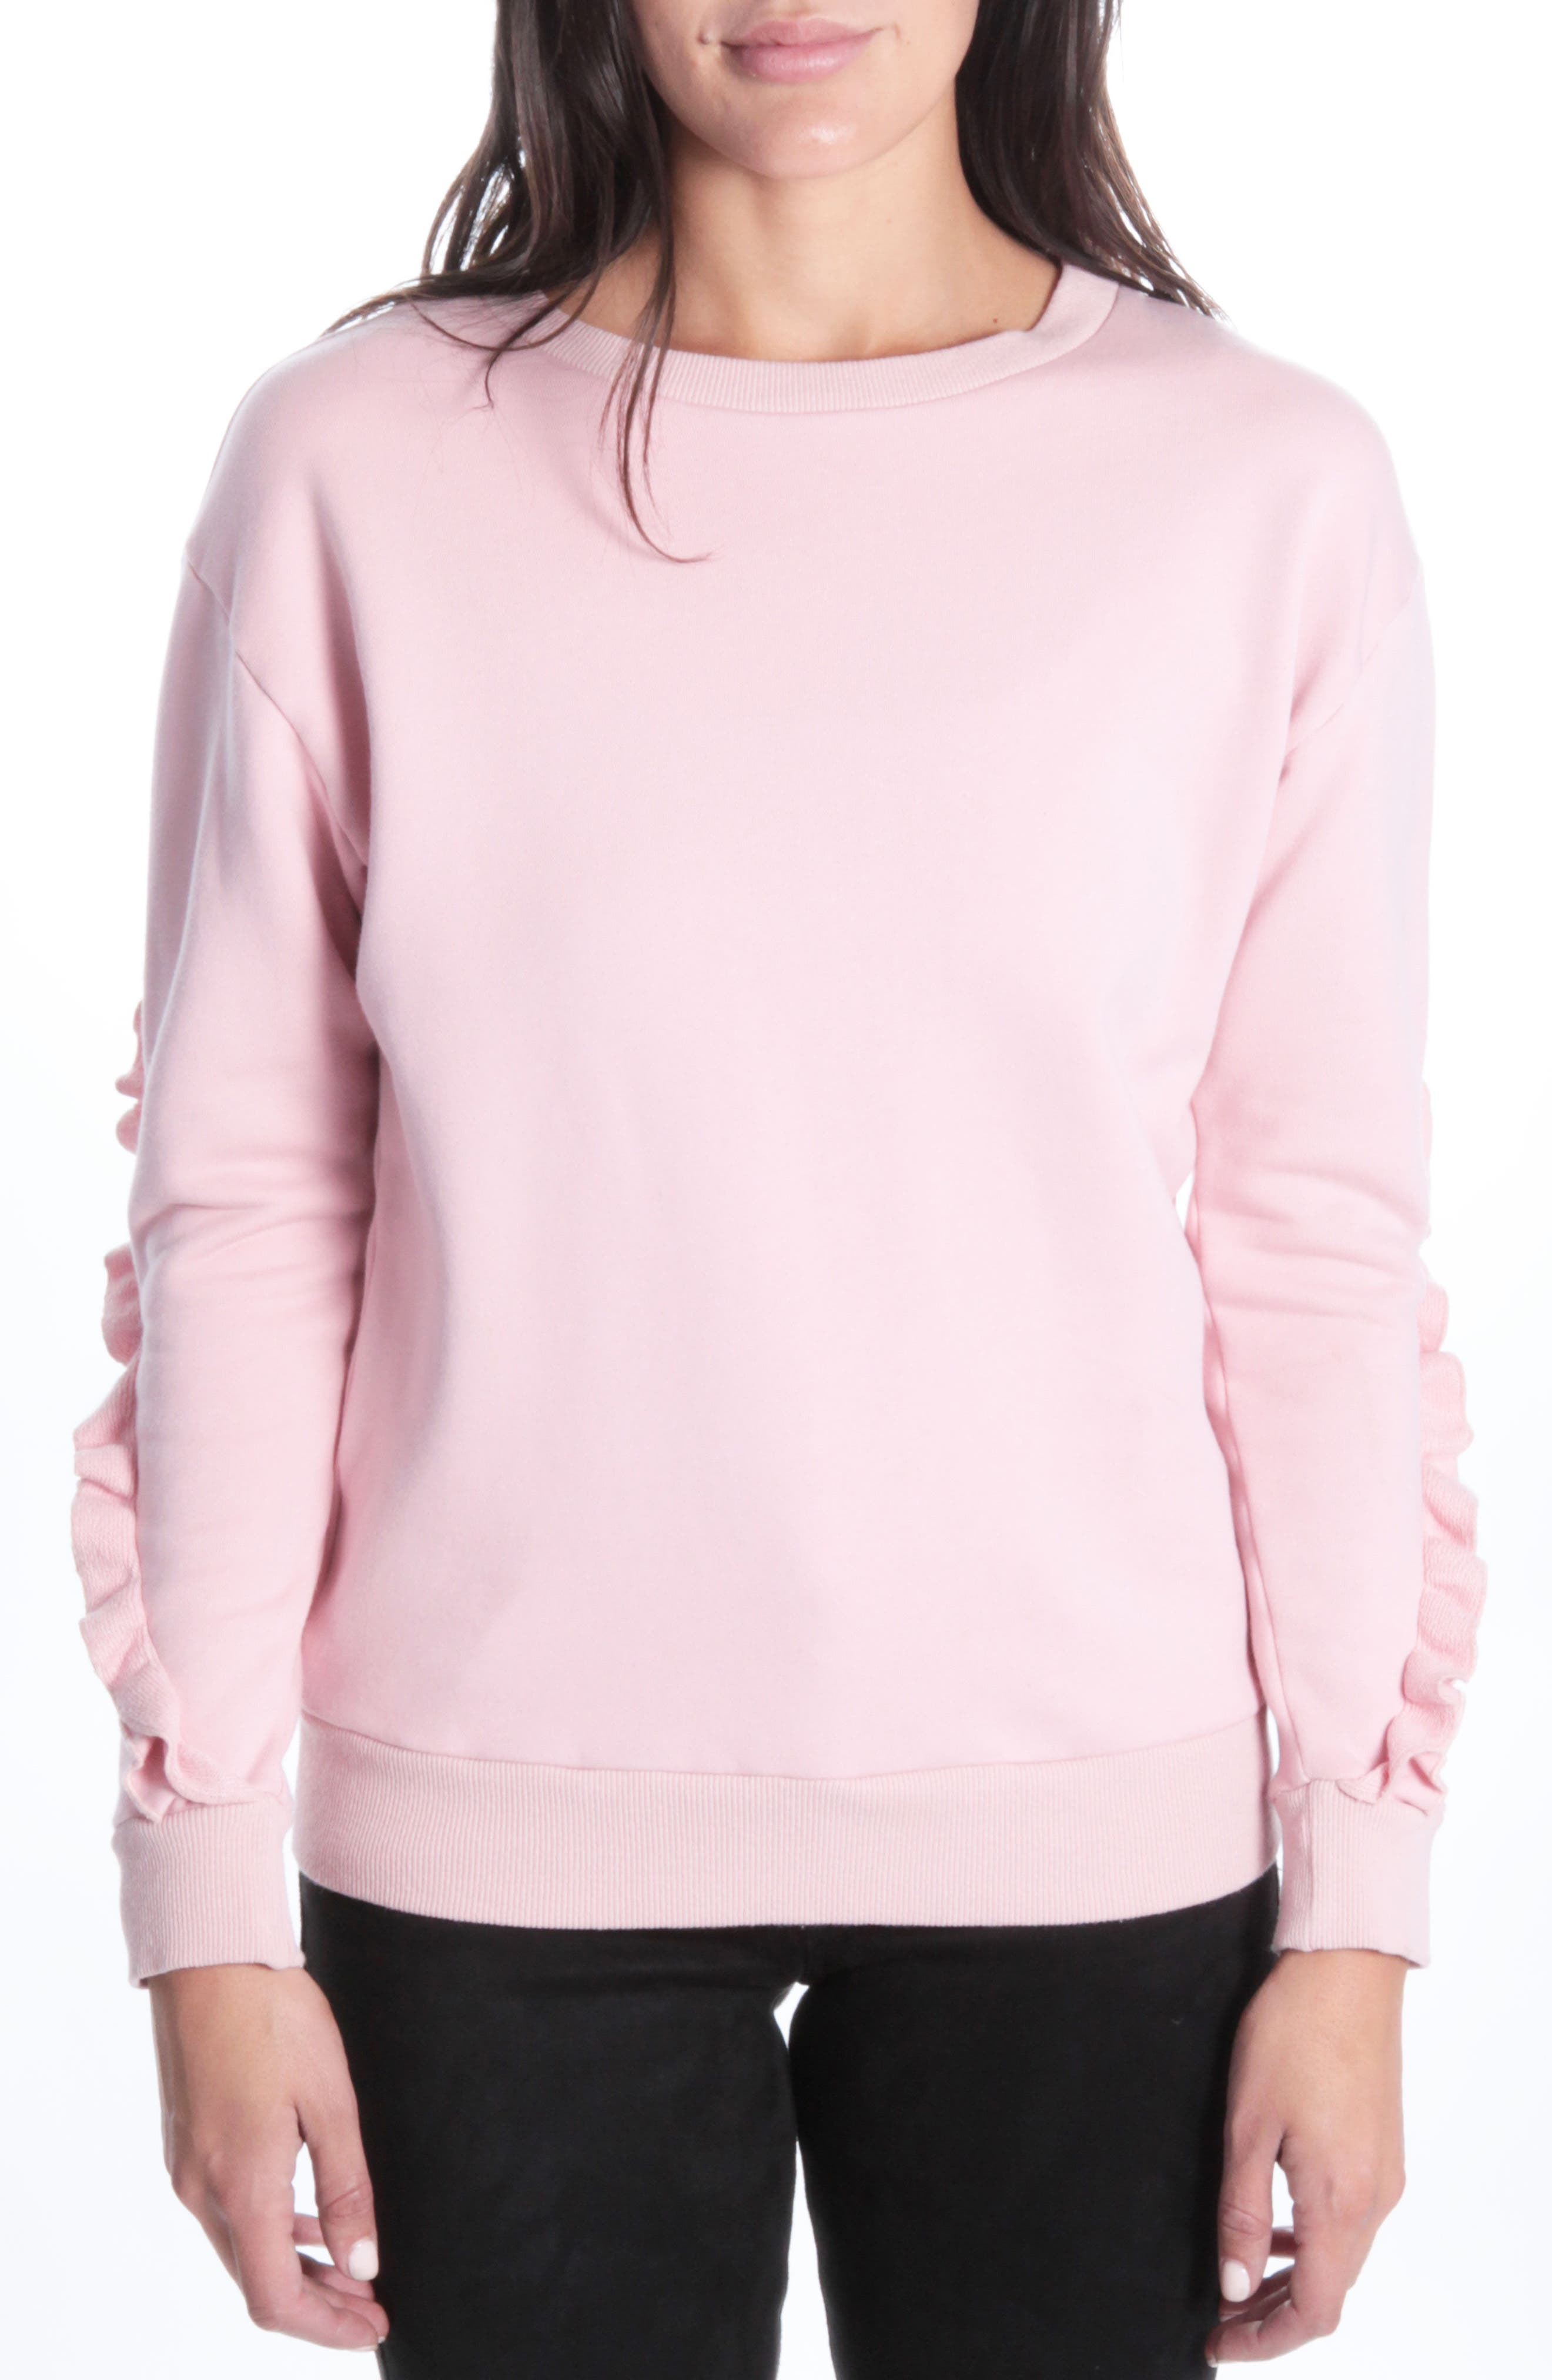 Lorilyn Sweatshirt,                         Main,                         color, 699